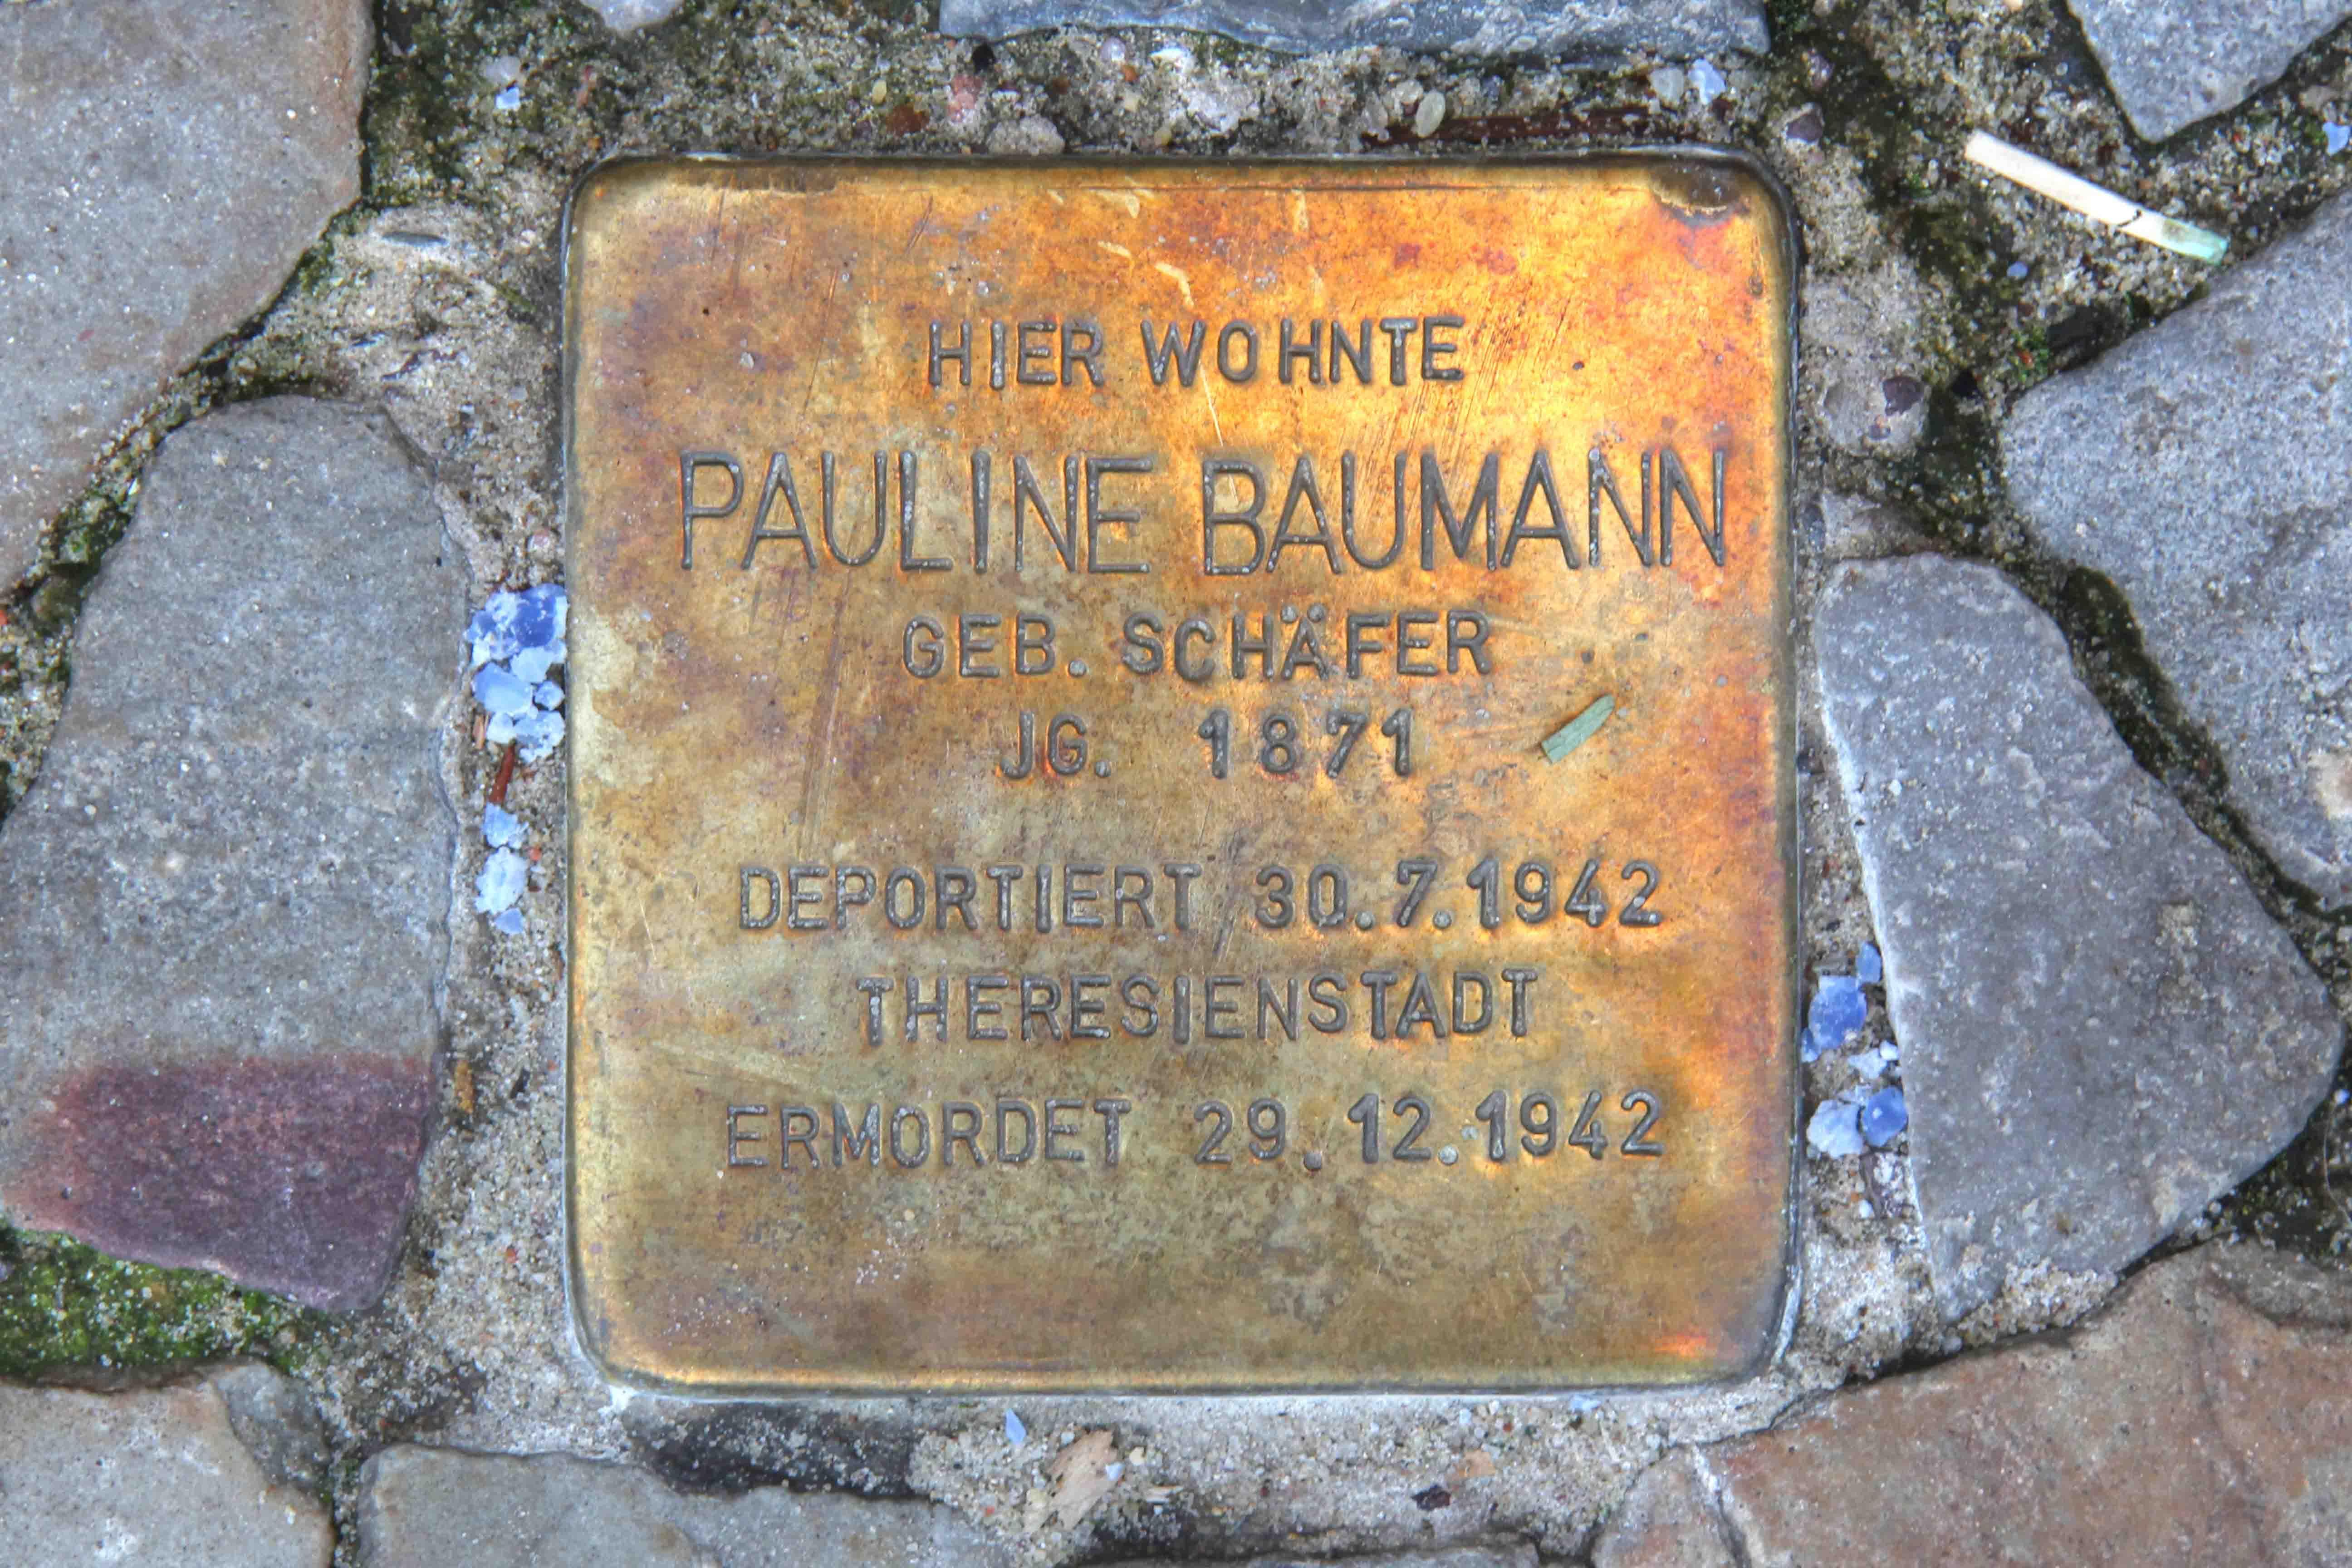 Stolpersteine Berlin 169 (1): In memory of Pauline Baumann (Leonhardtstrasse 5)